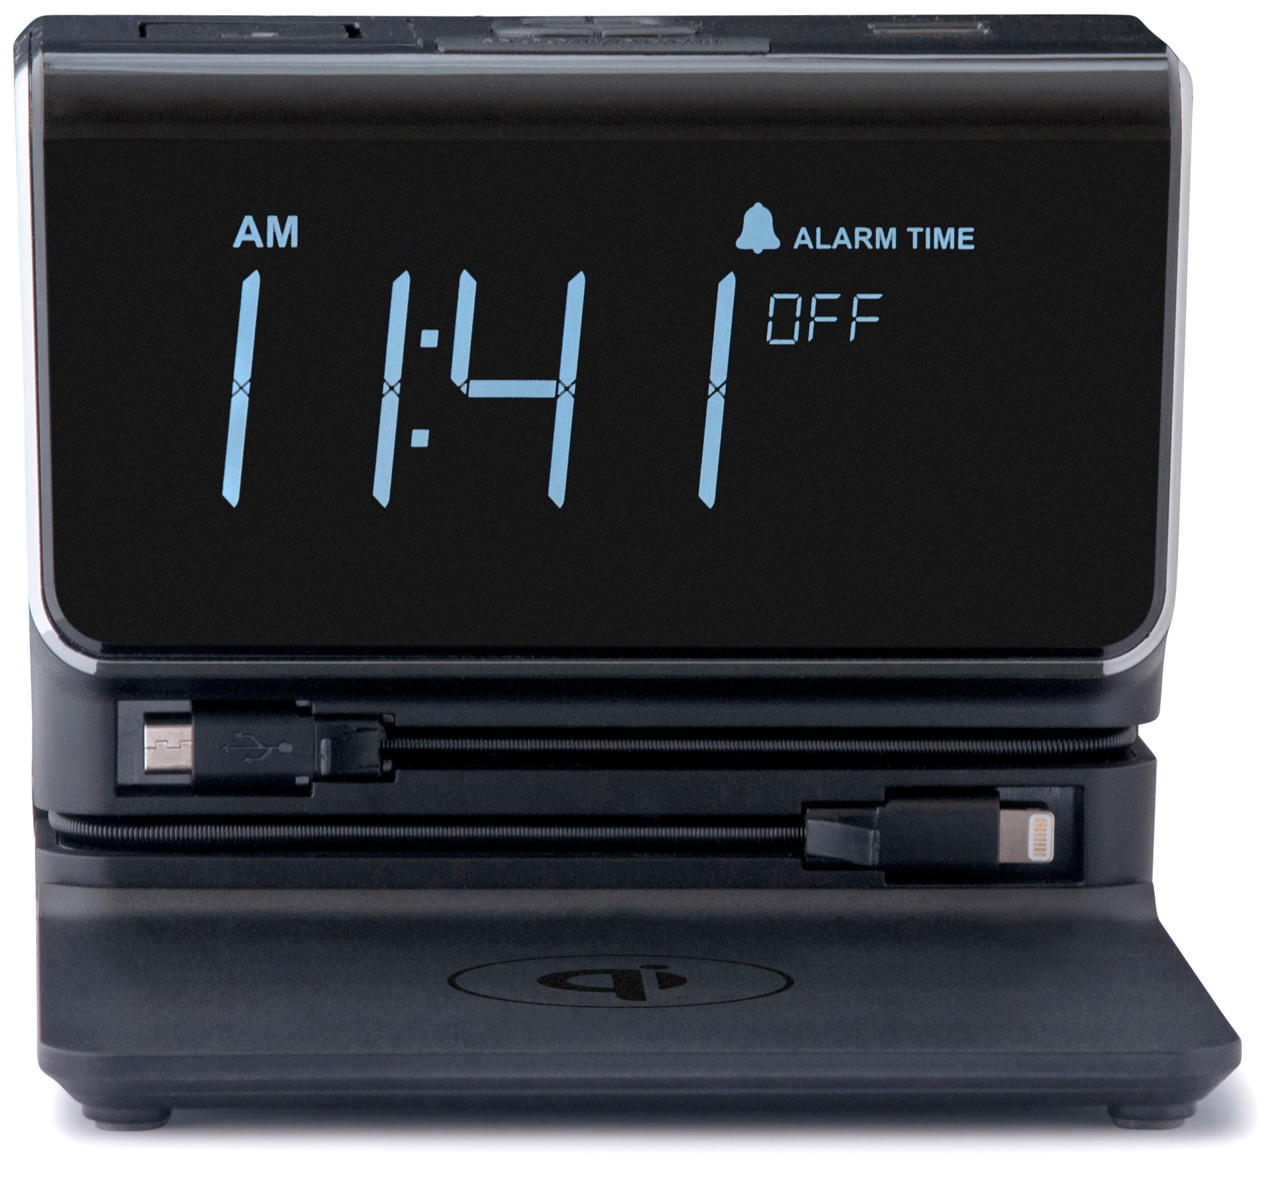 Kurrent is The Best Alarm Clock with Qi Wireless Charging   Tek Tok